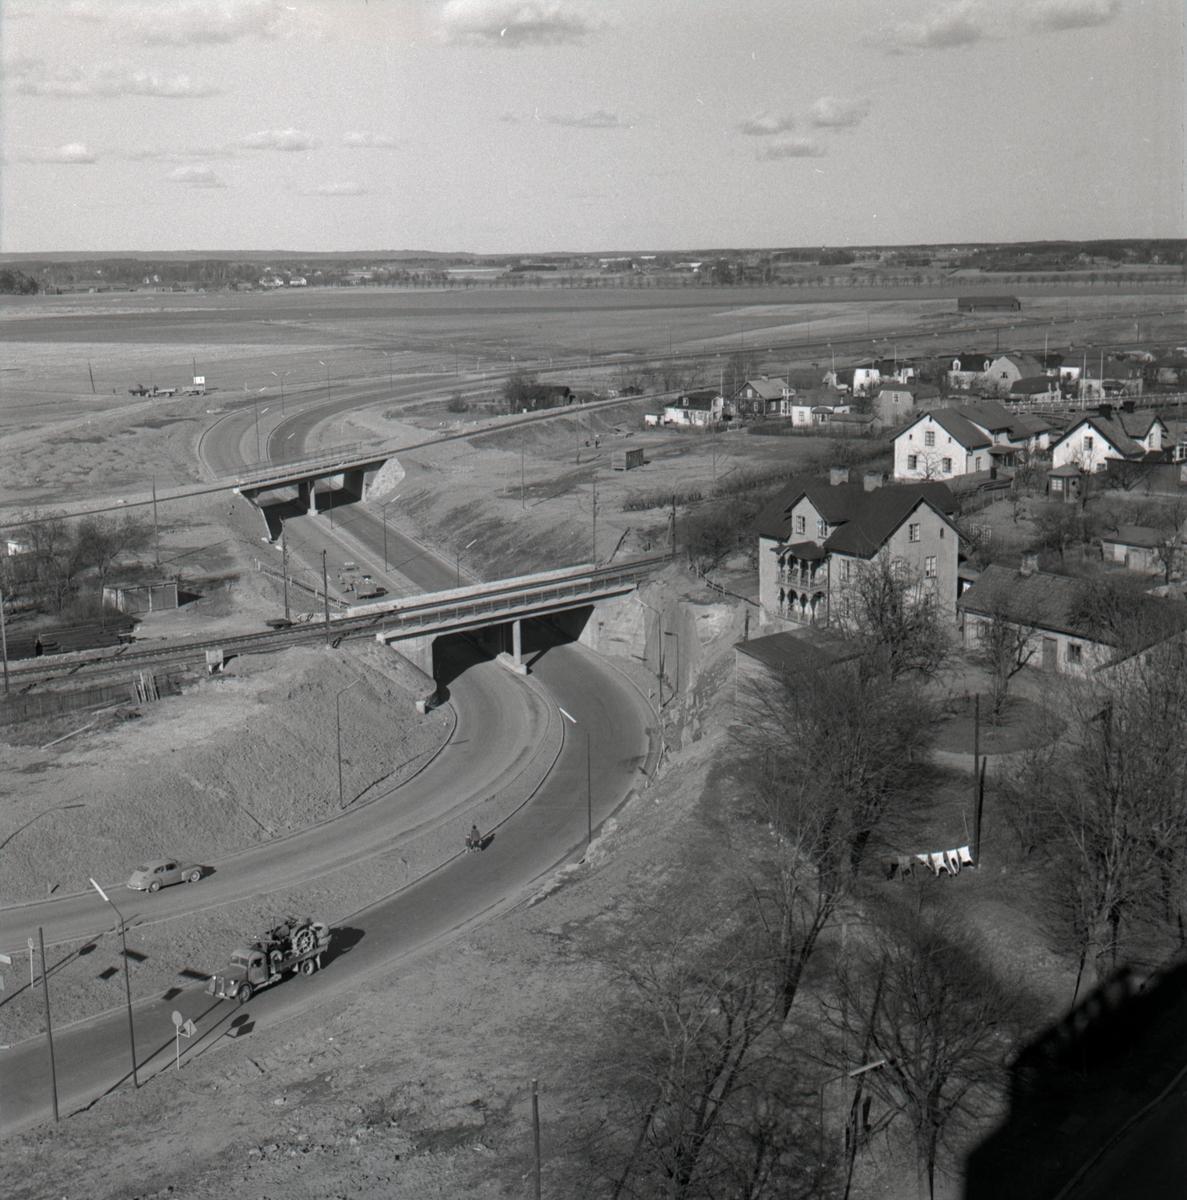 Orig. text: Ny bro vid Stångebro.